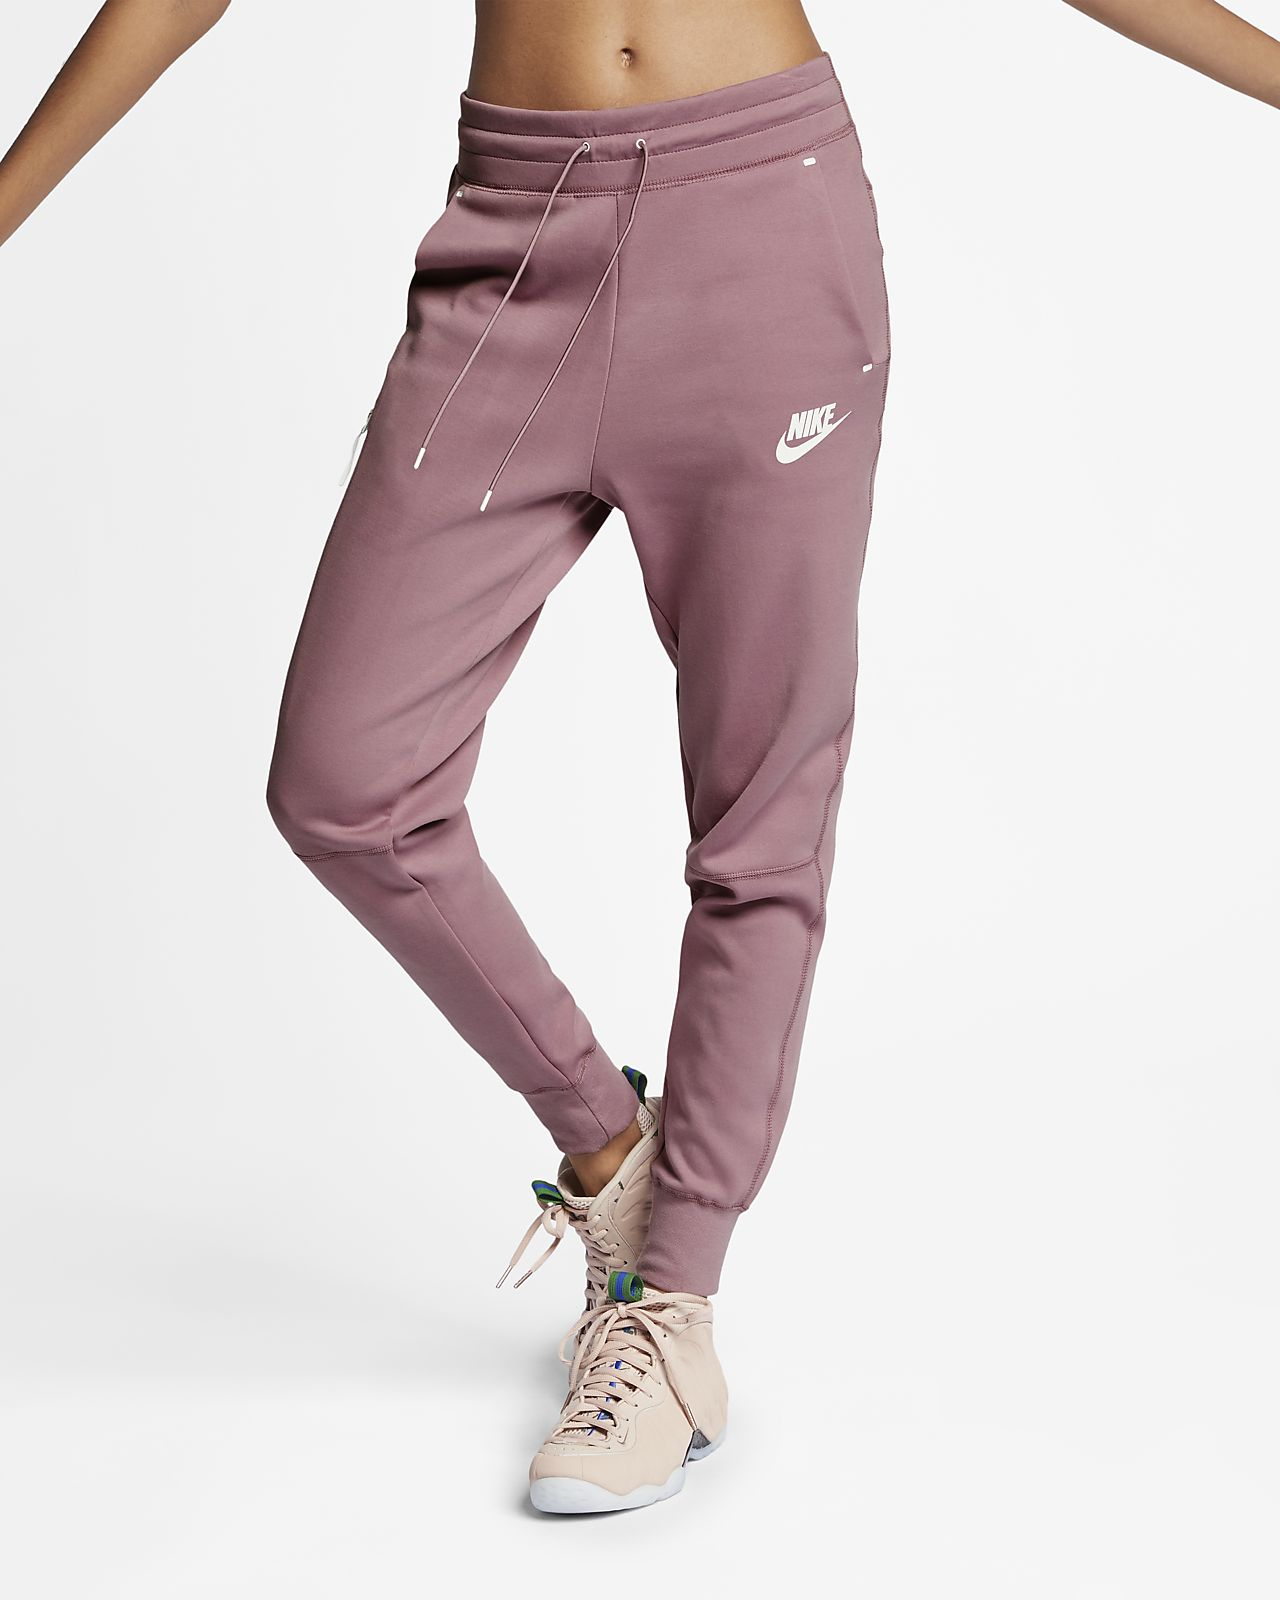 5bd17079 Nike Sportswear Tech Fleece-bukser til kvinder. Nike.com DK